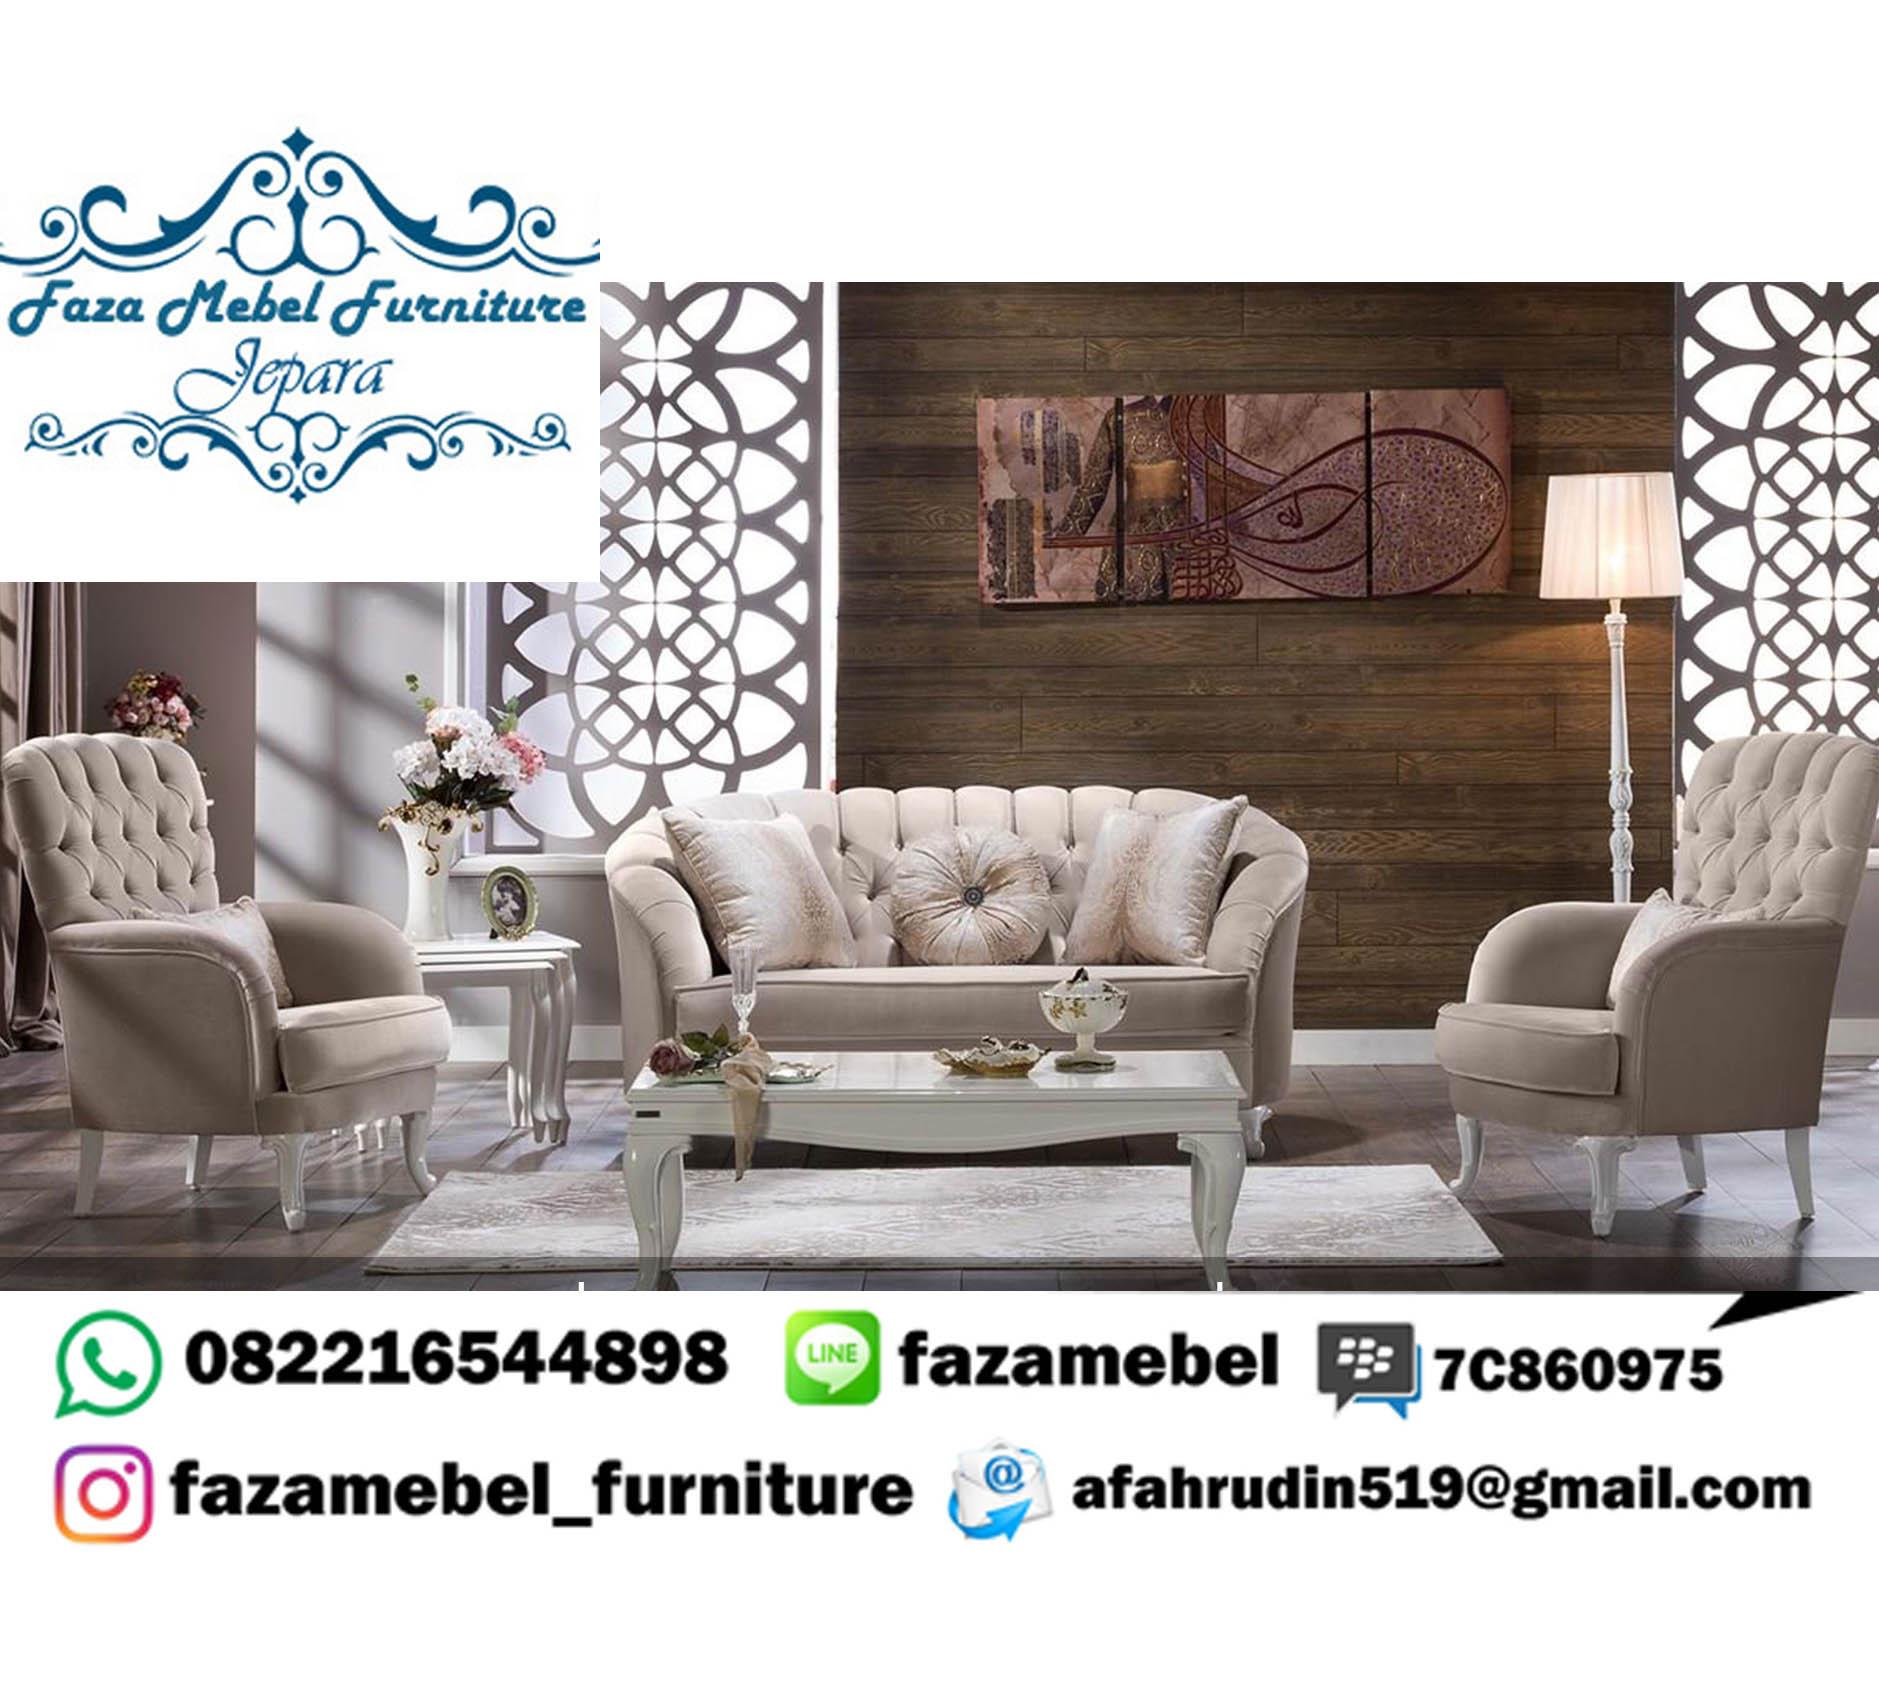 harga-sofa-tamu-minimalis-modern (4)